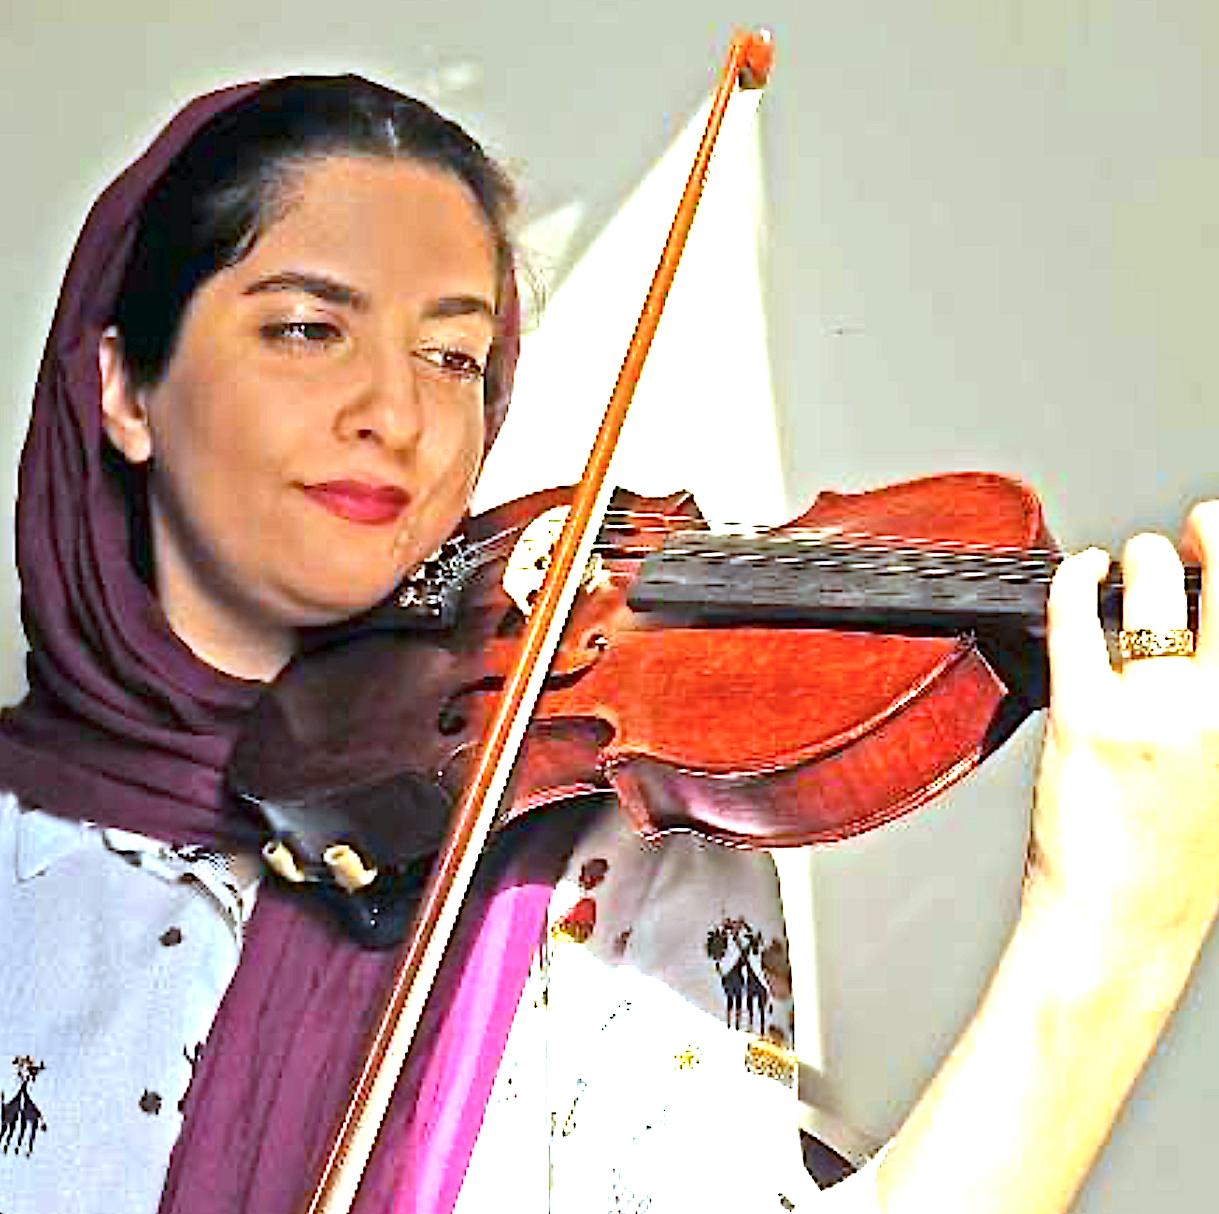 فریبا شریف مدرس ویولن کودکان به روش سوزوکی